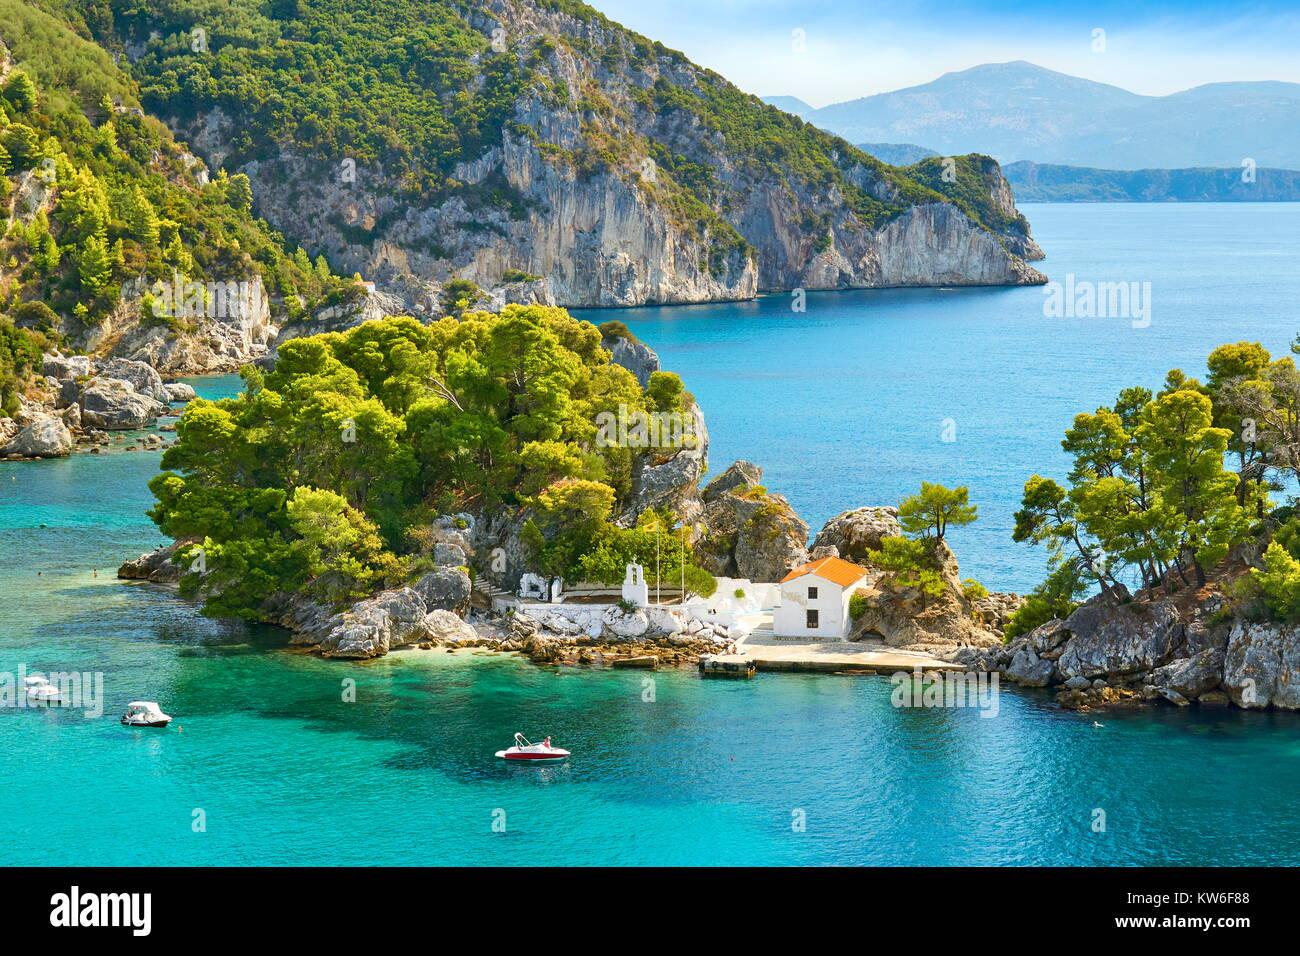 Kleine Kapelle an Panagias Insel, Parga, Griechenland Stockbild